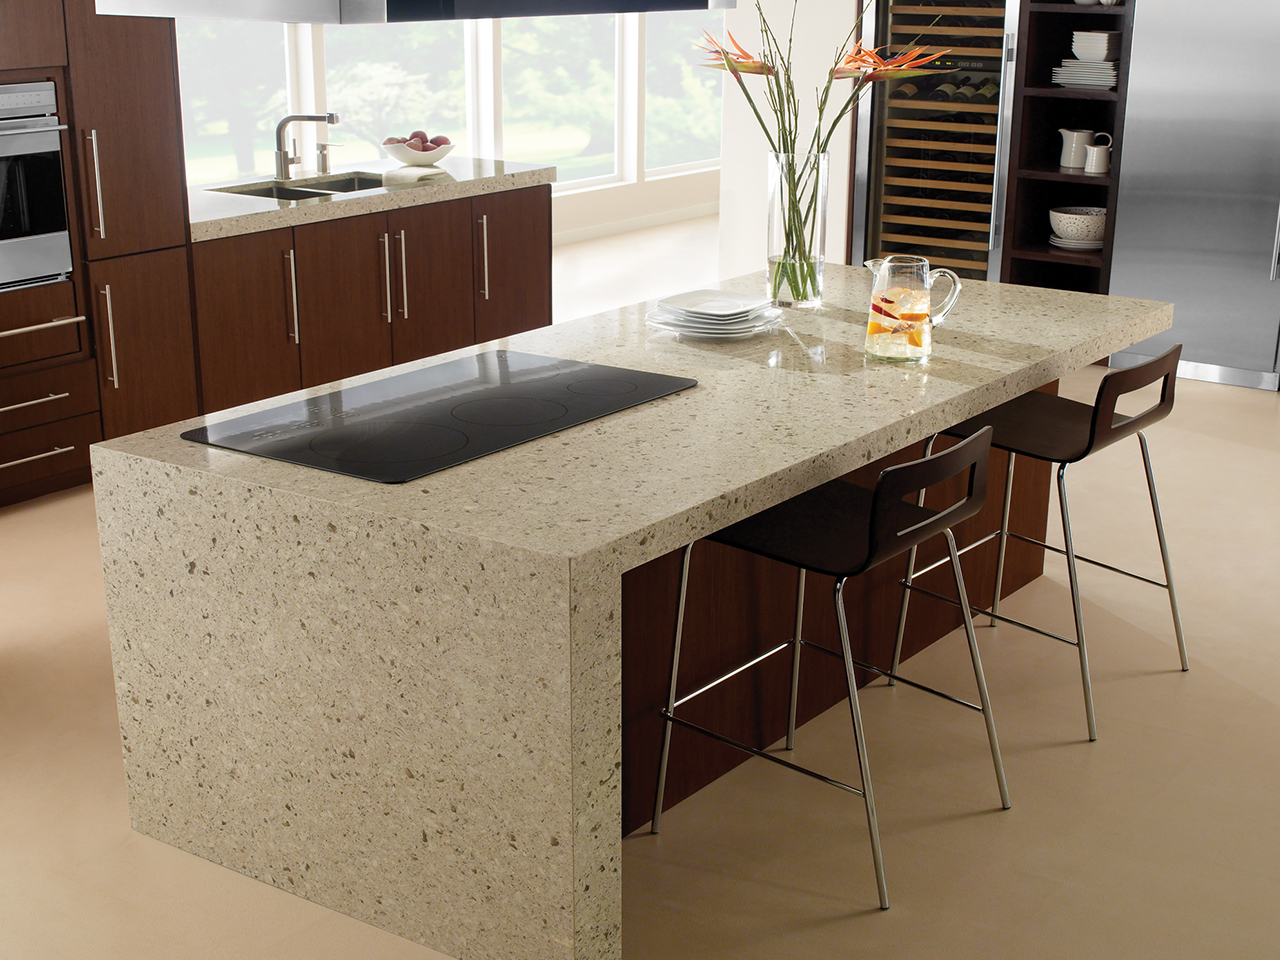 Darlington cambria miami circle marble fabrication for Cambria slab size